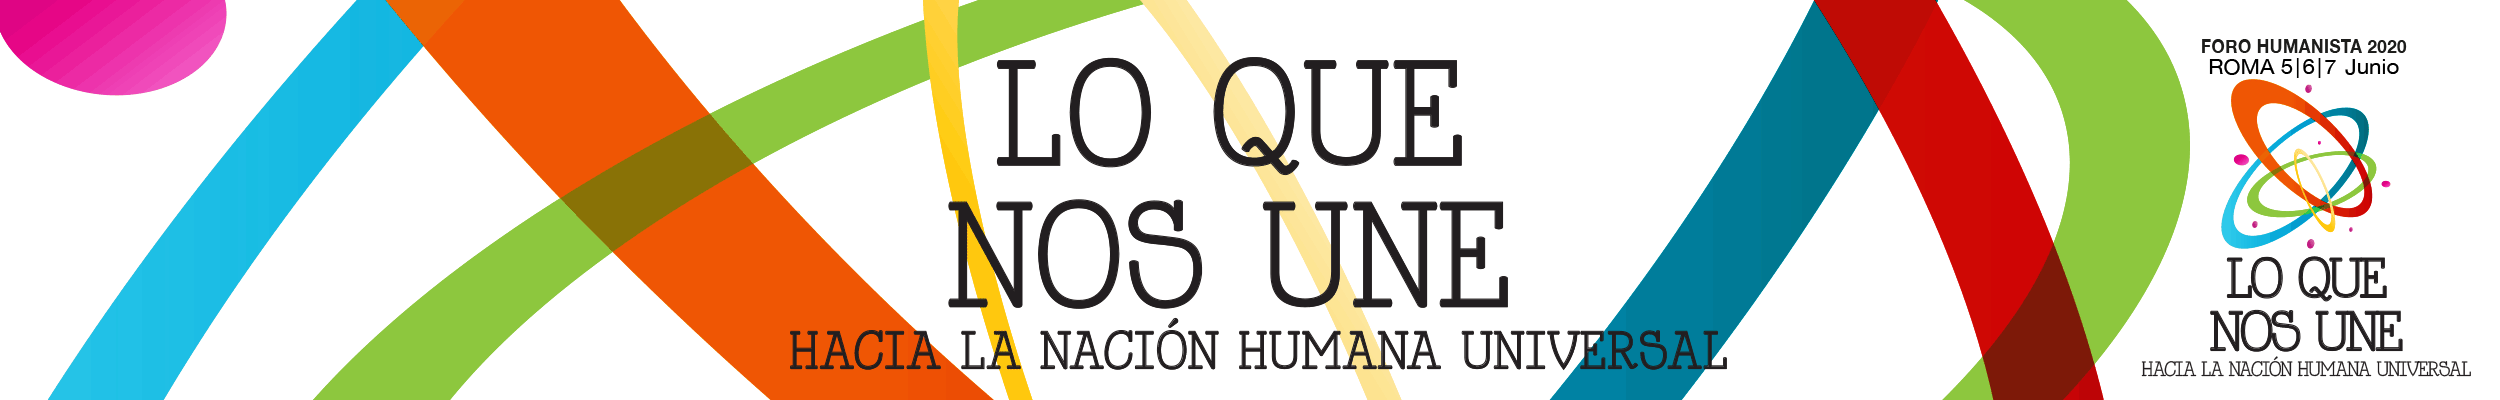 Foro Humanista